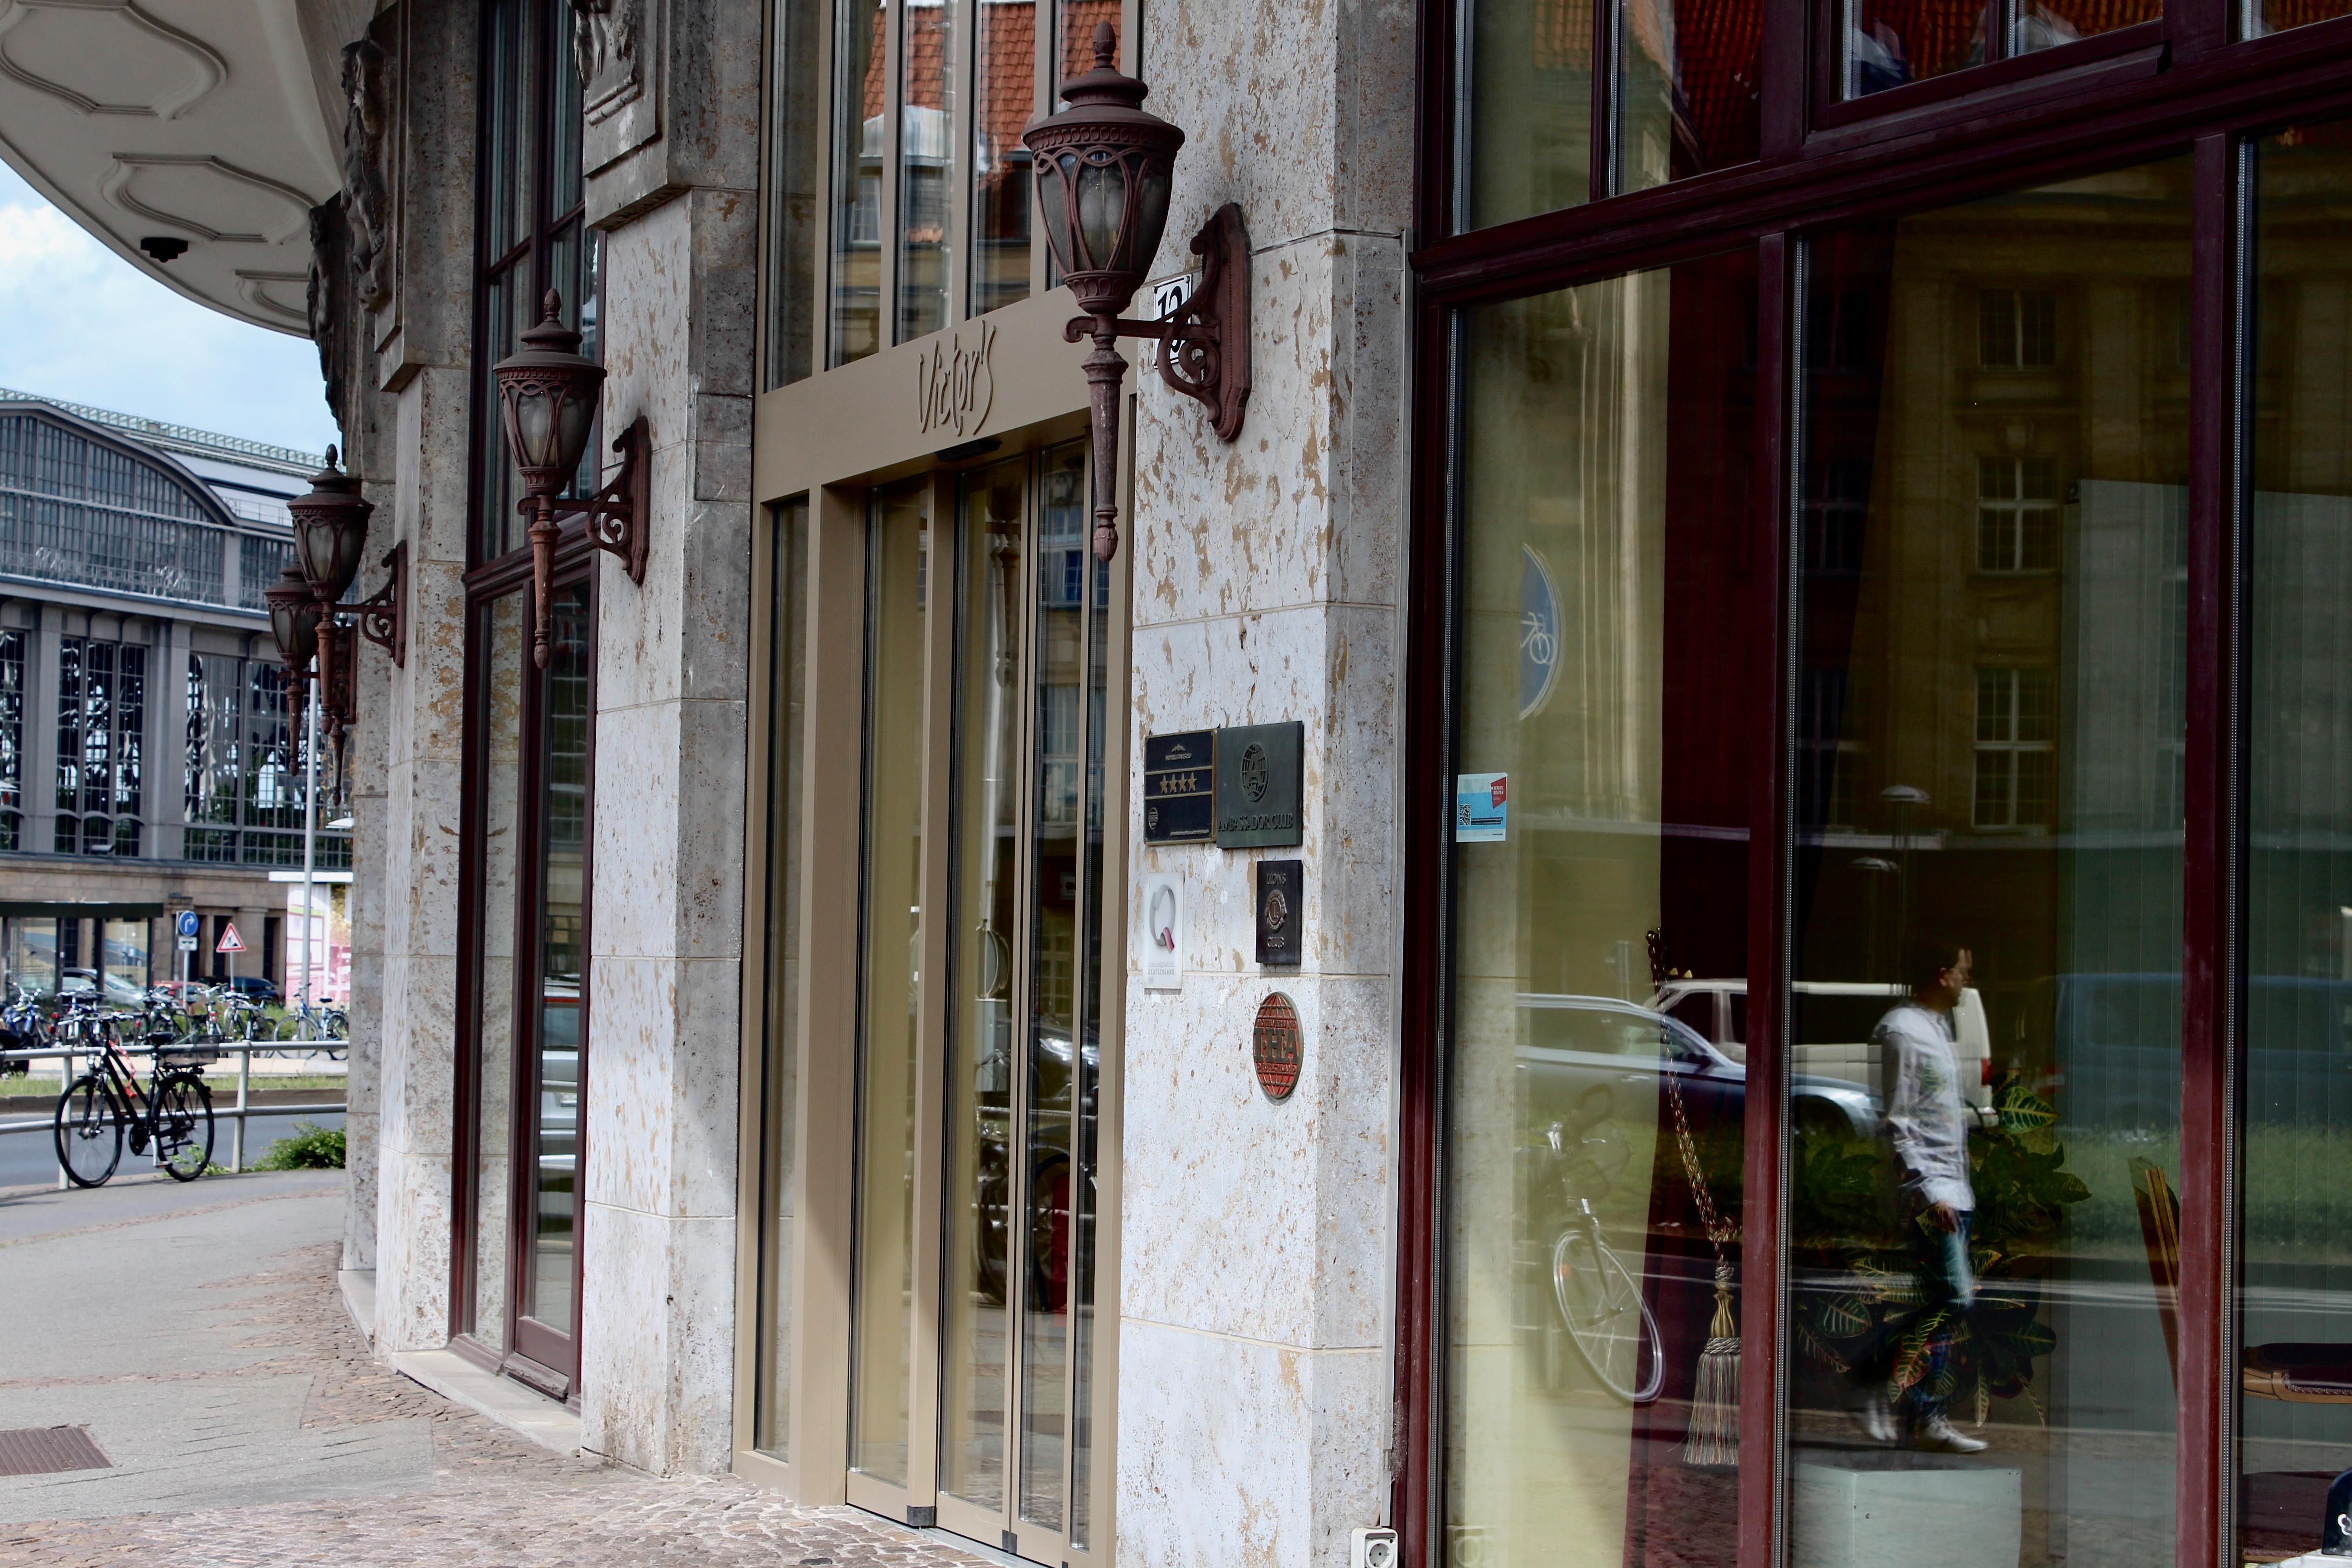 Entrance Victors Residenz-Hotel Leipzig